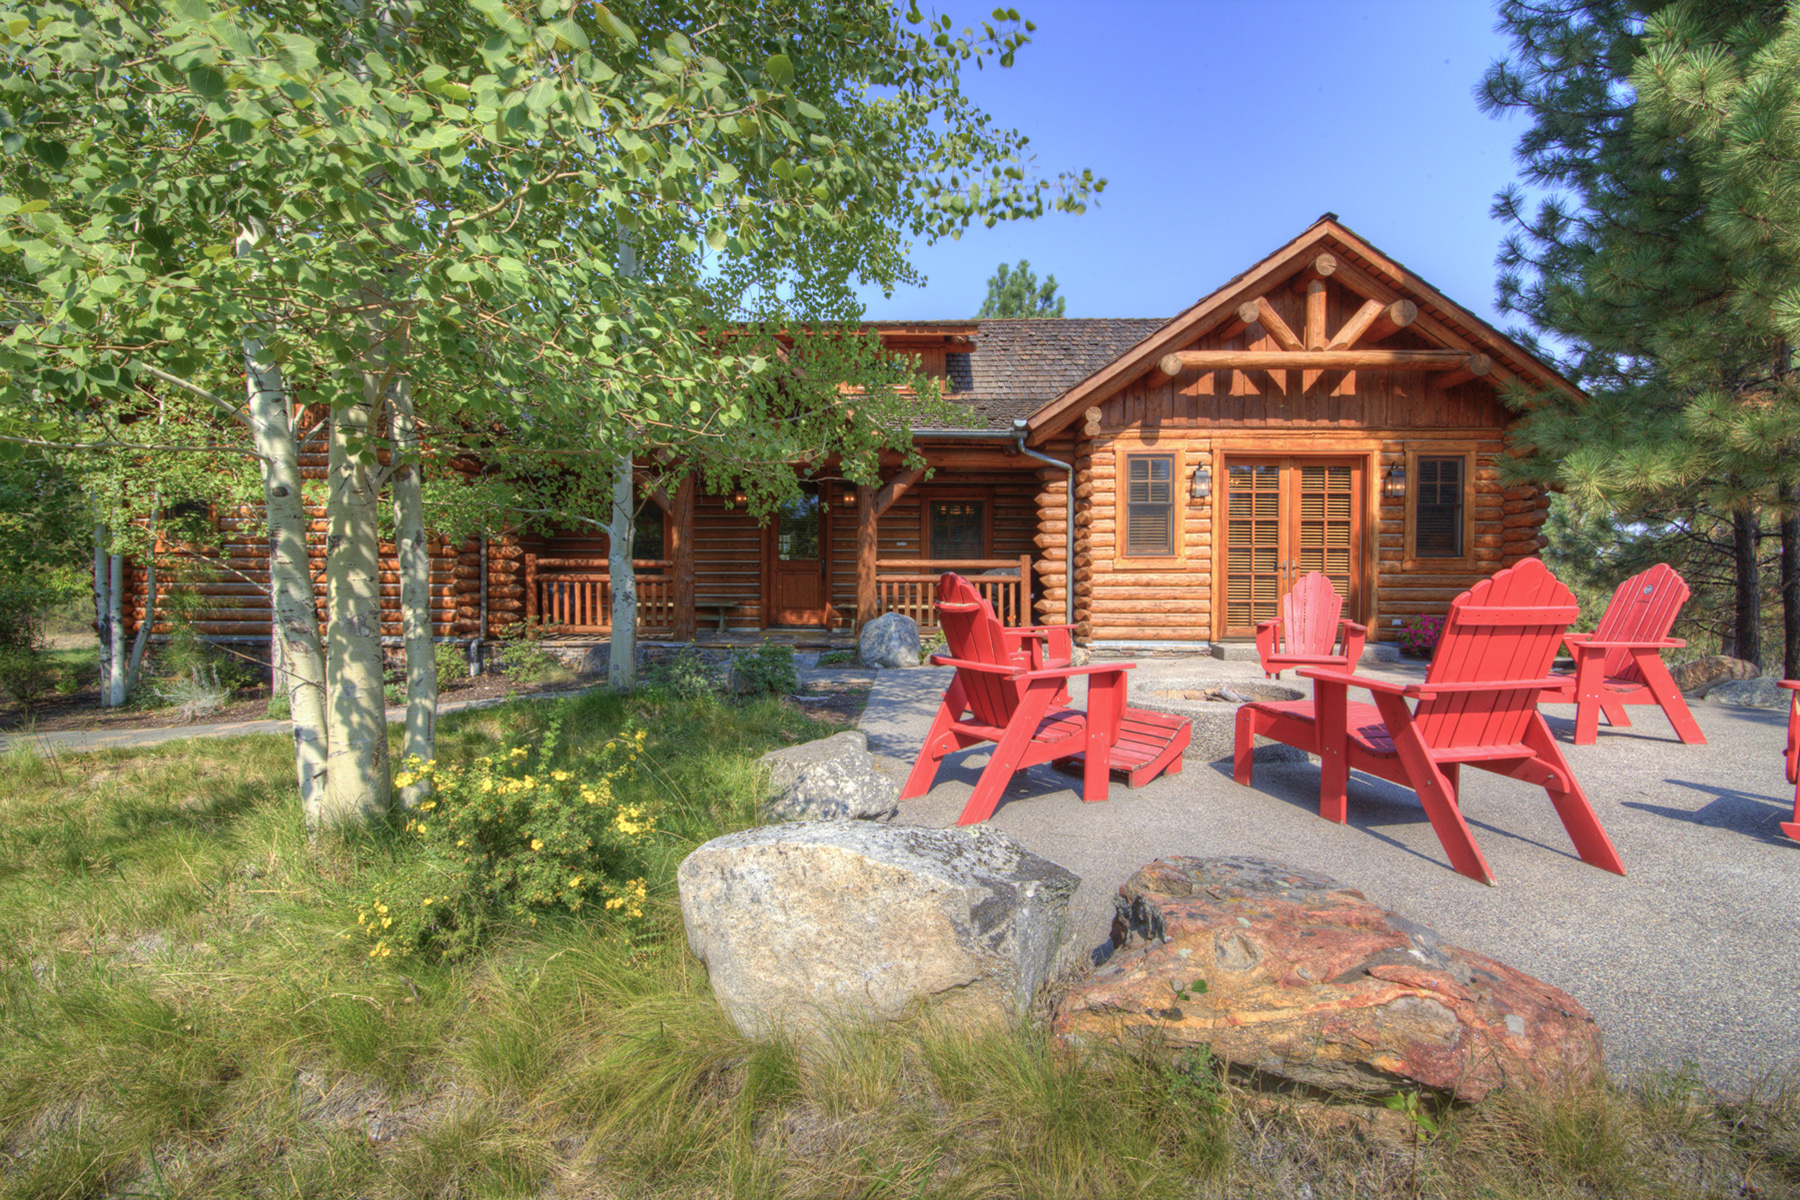 Single Family Home for Sale at Stock Farm Cabin 28 770 Pallo Trail Hamilton, Montana, 59840 United States